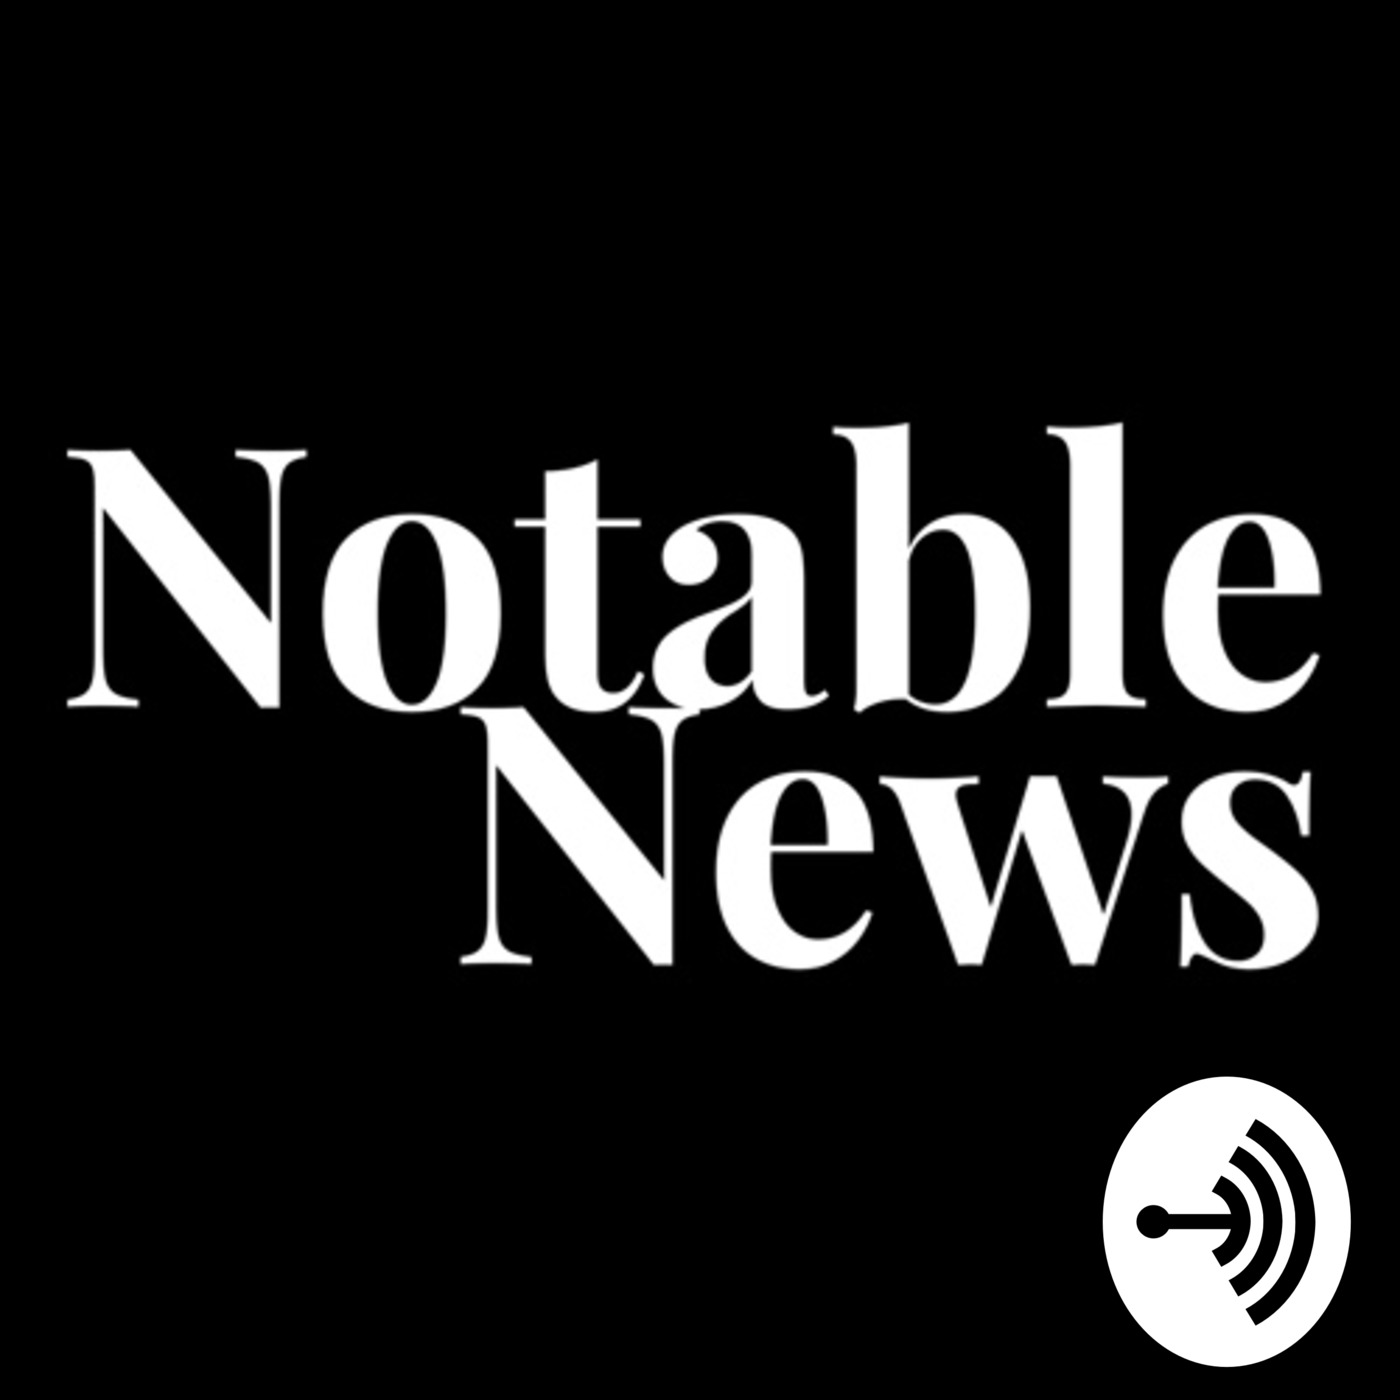 Notable News, 9/27/2017